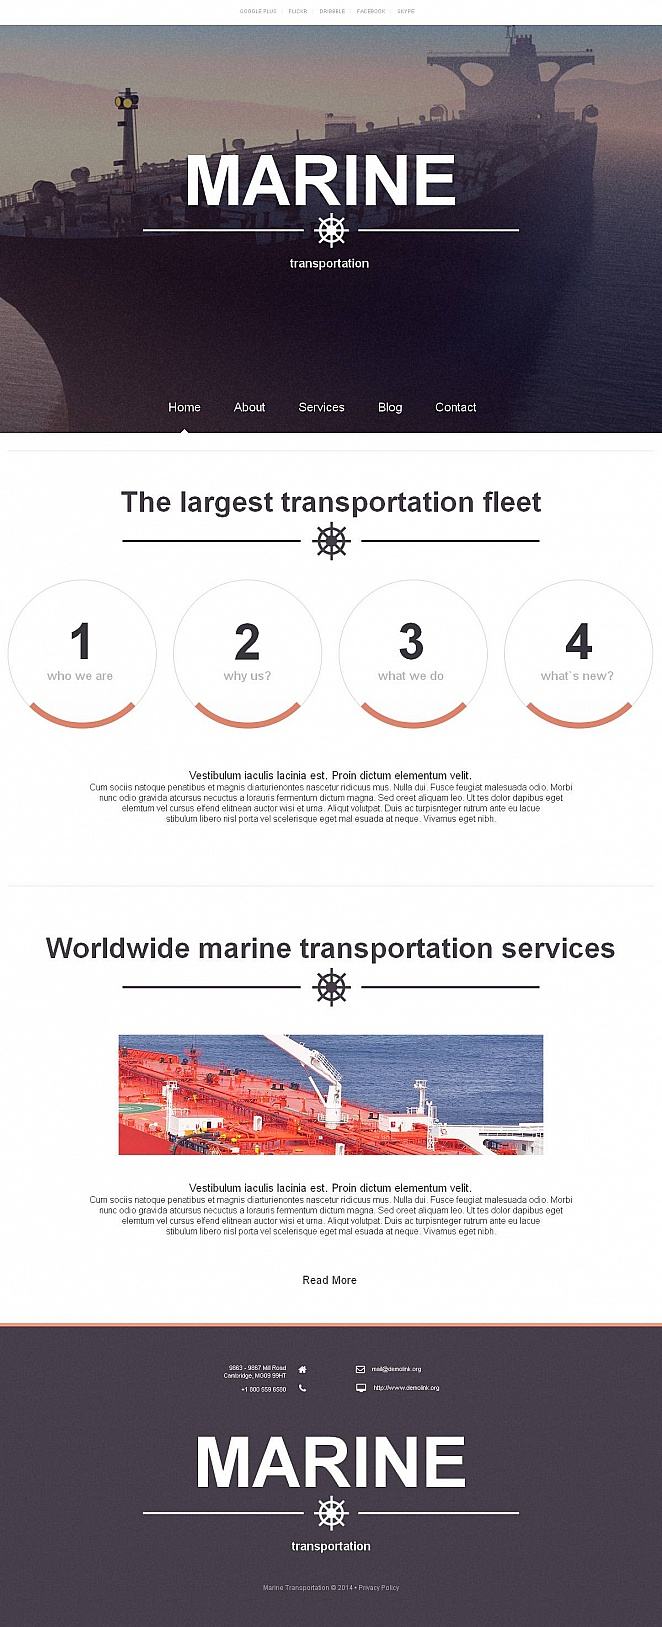 Marine Transportation Website Template with Large Header Image - image